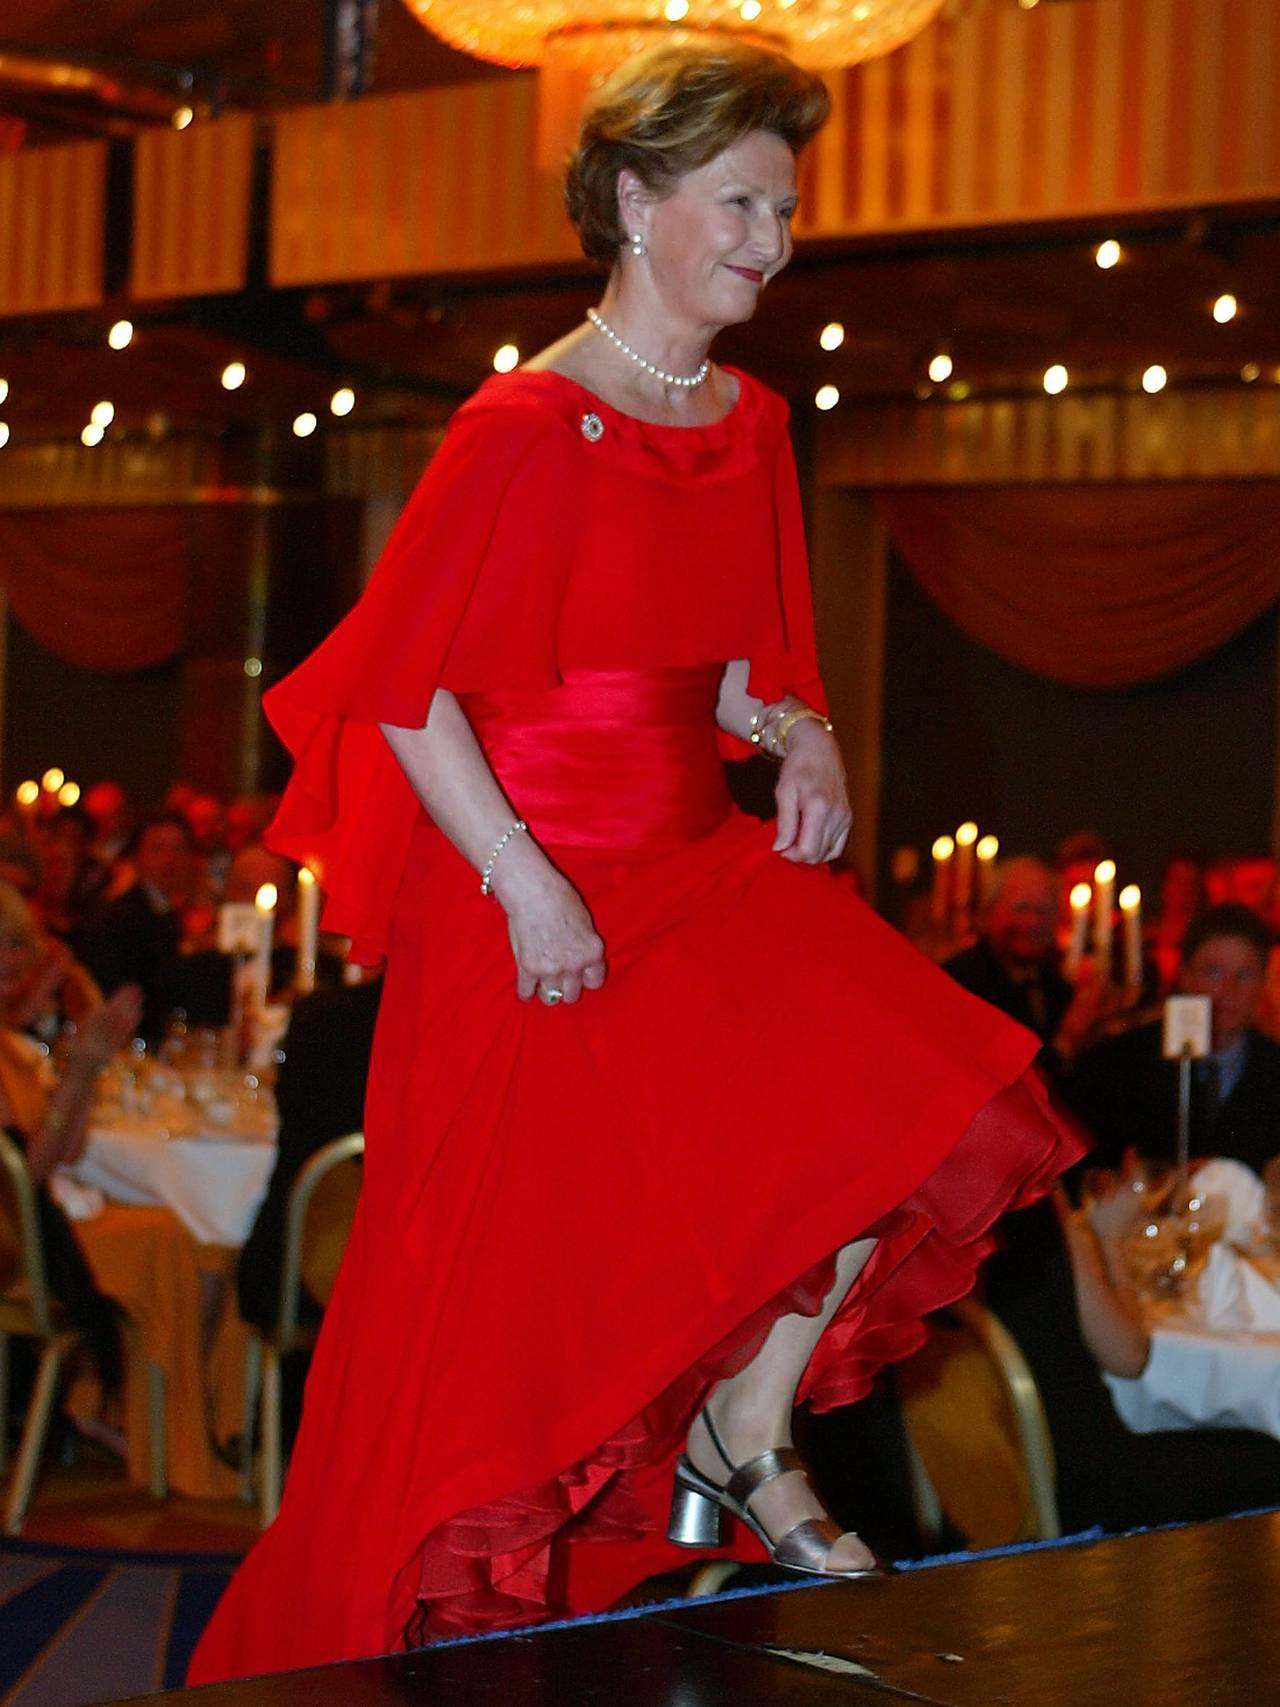 Dronning Sonja rød kjole